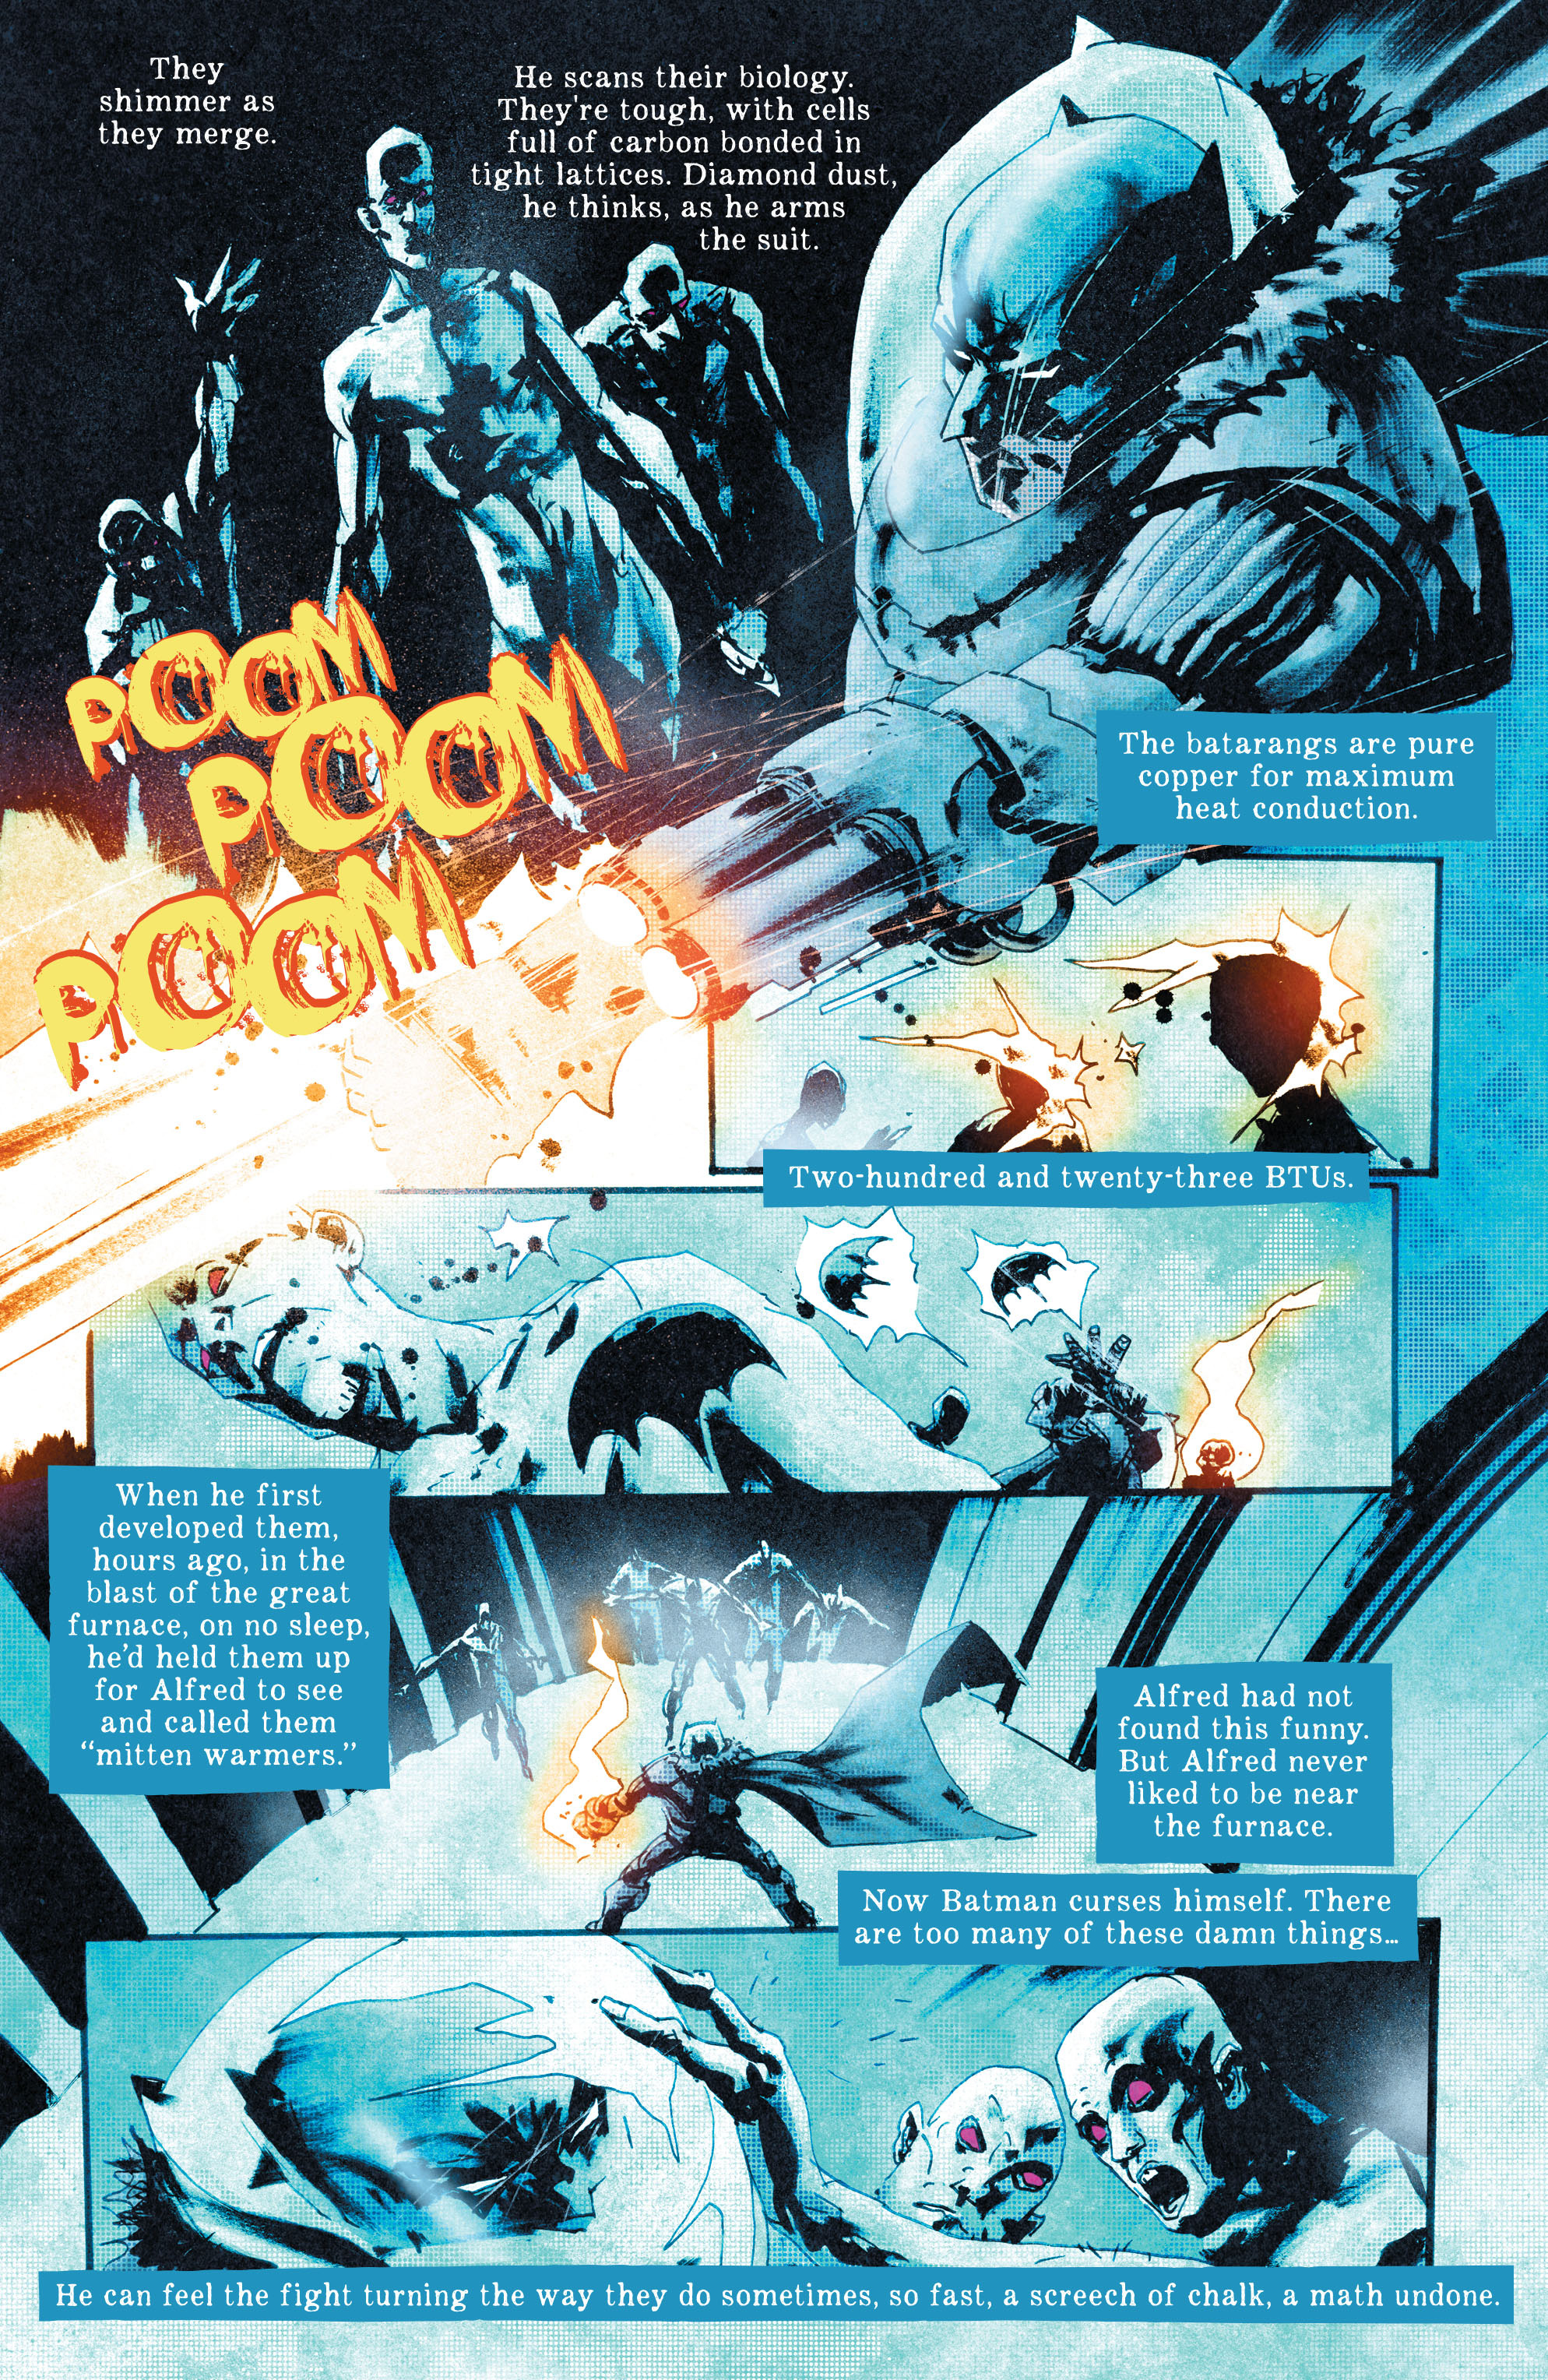 Read online All-Star Batman comic -  Issue #6 - 9